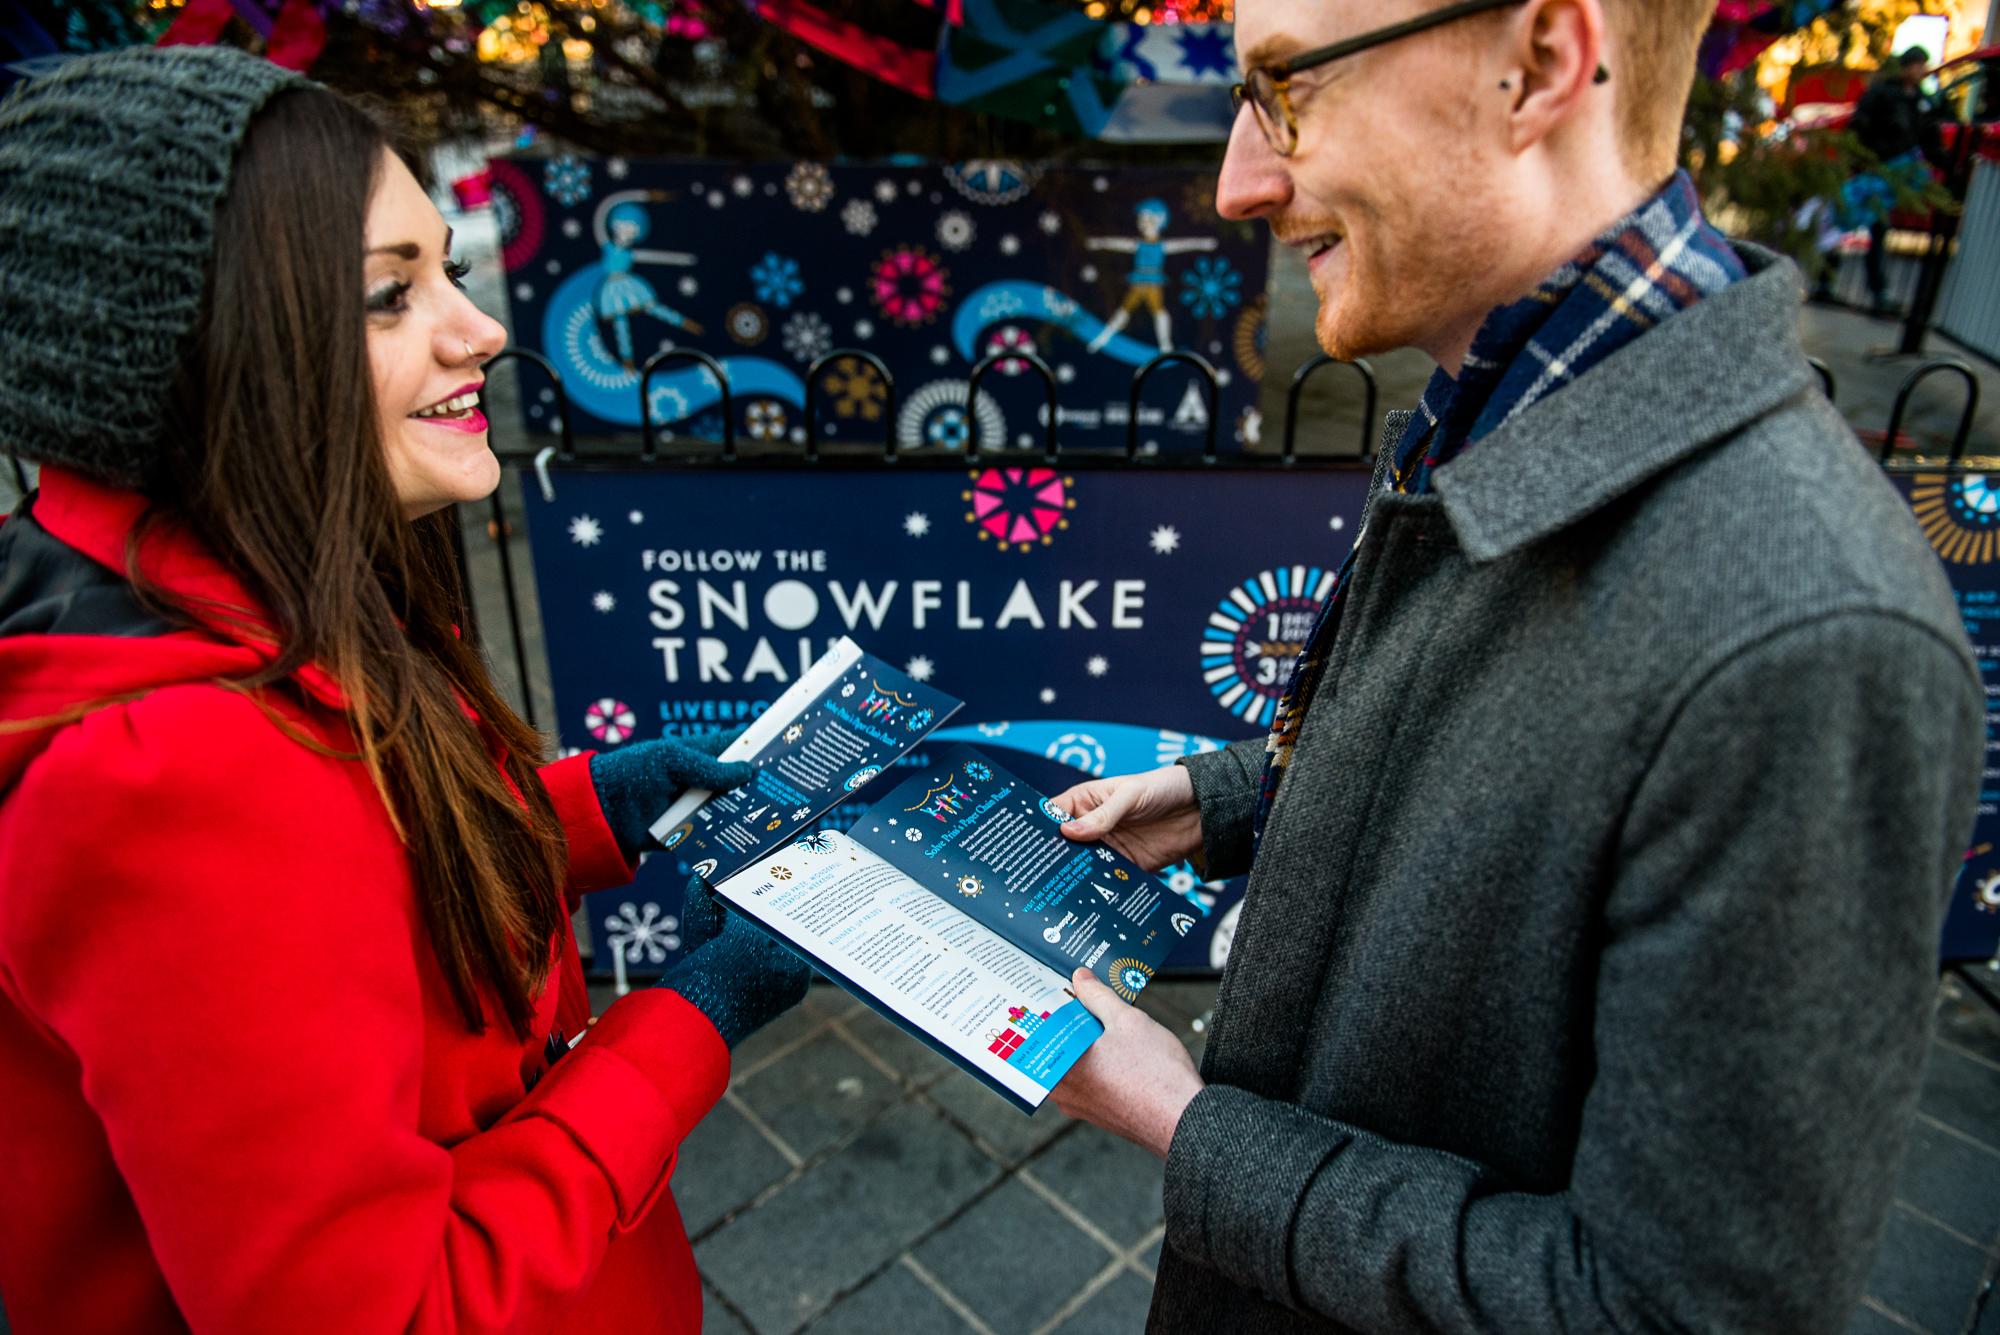 snowflake_trail_liverpool-3.jpg